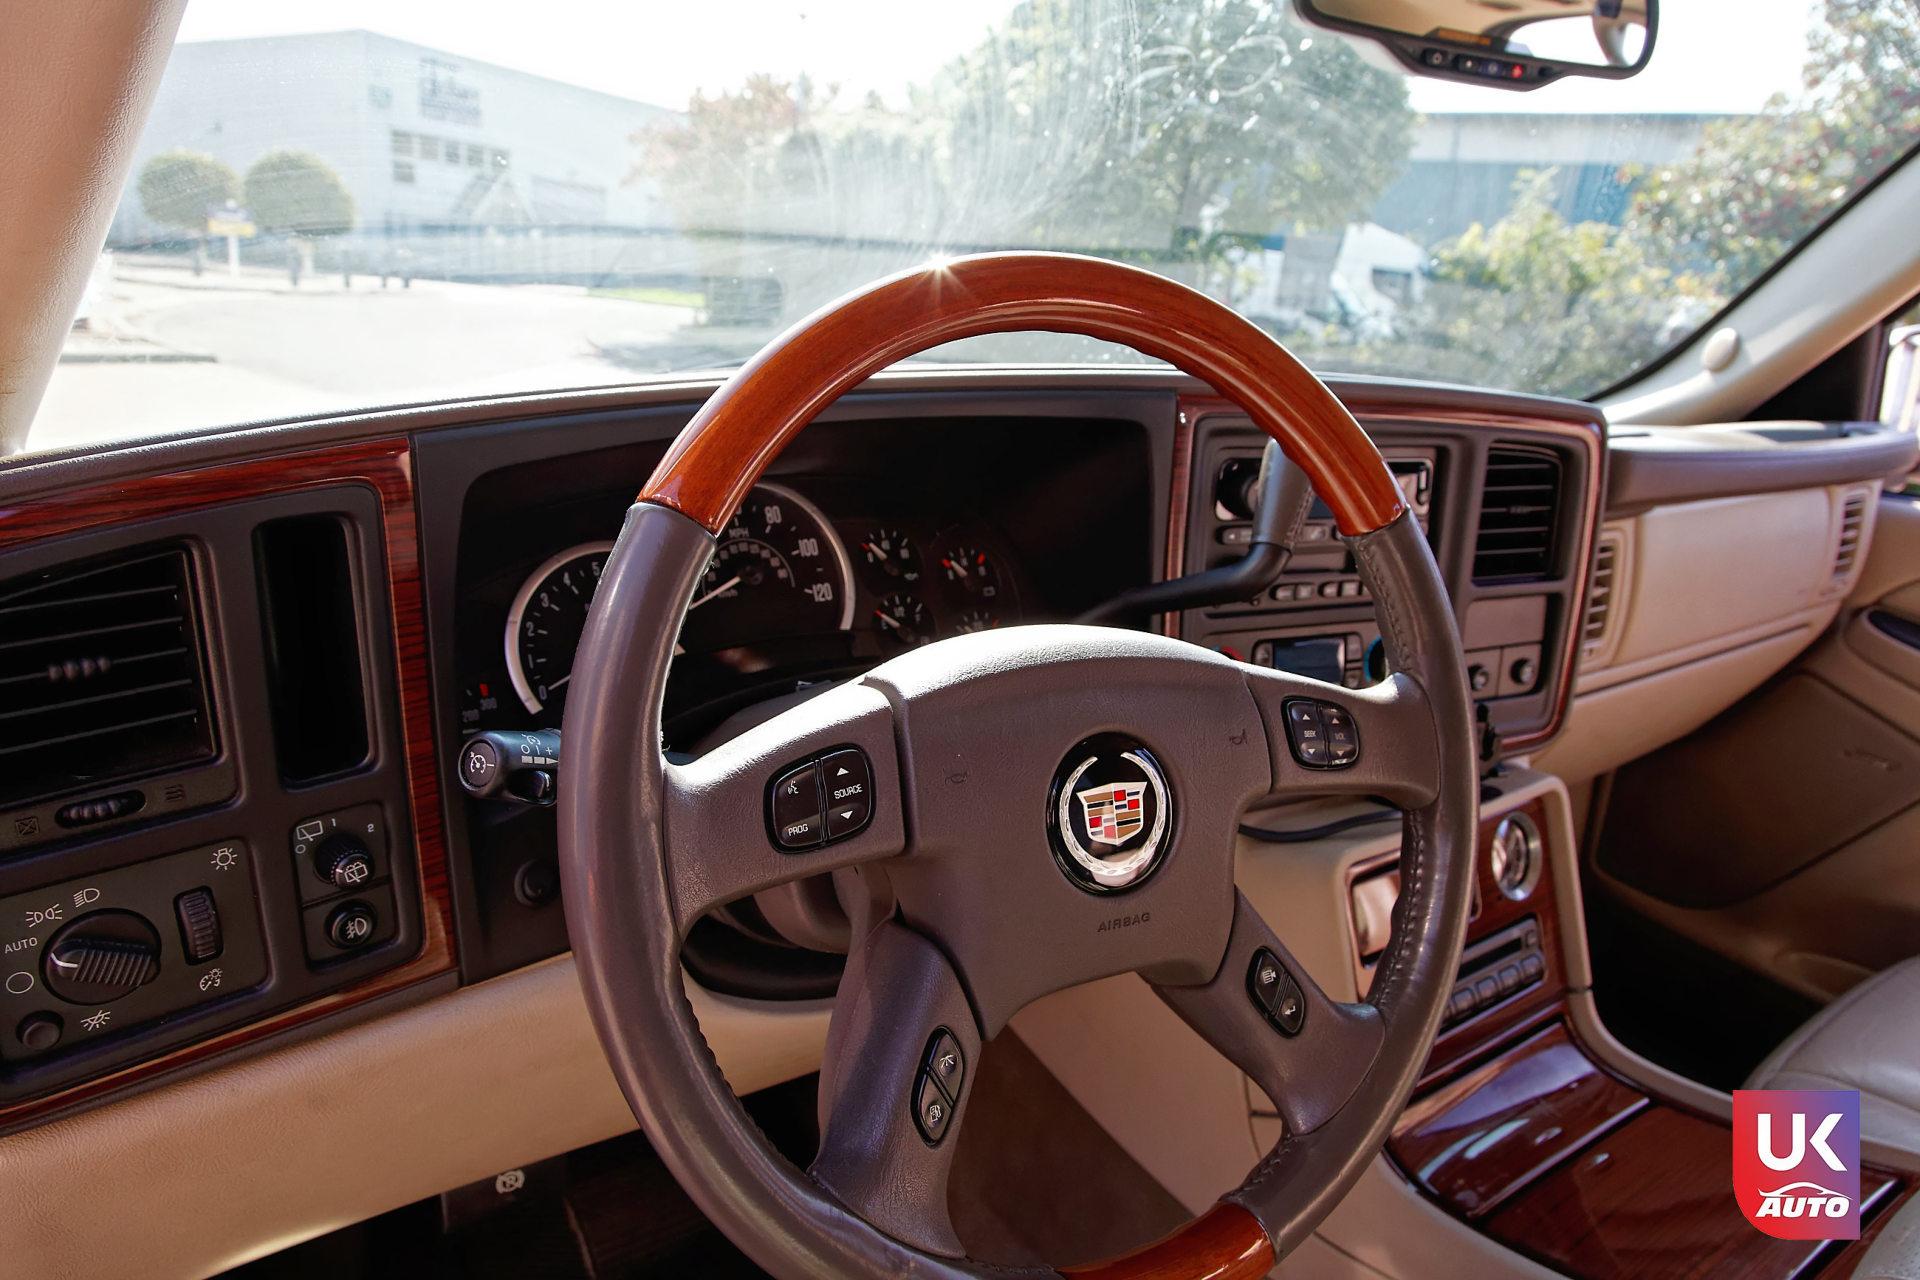 Cadillac Escalade lhd import cadillac angleterre cadillac uk ukauto us import lhd10 DxO - AUTO IMPORT CADILLAC ESCALADE V8 LHD IMPORTATION CADILLAC LHD FELICITATION A BERTRAND